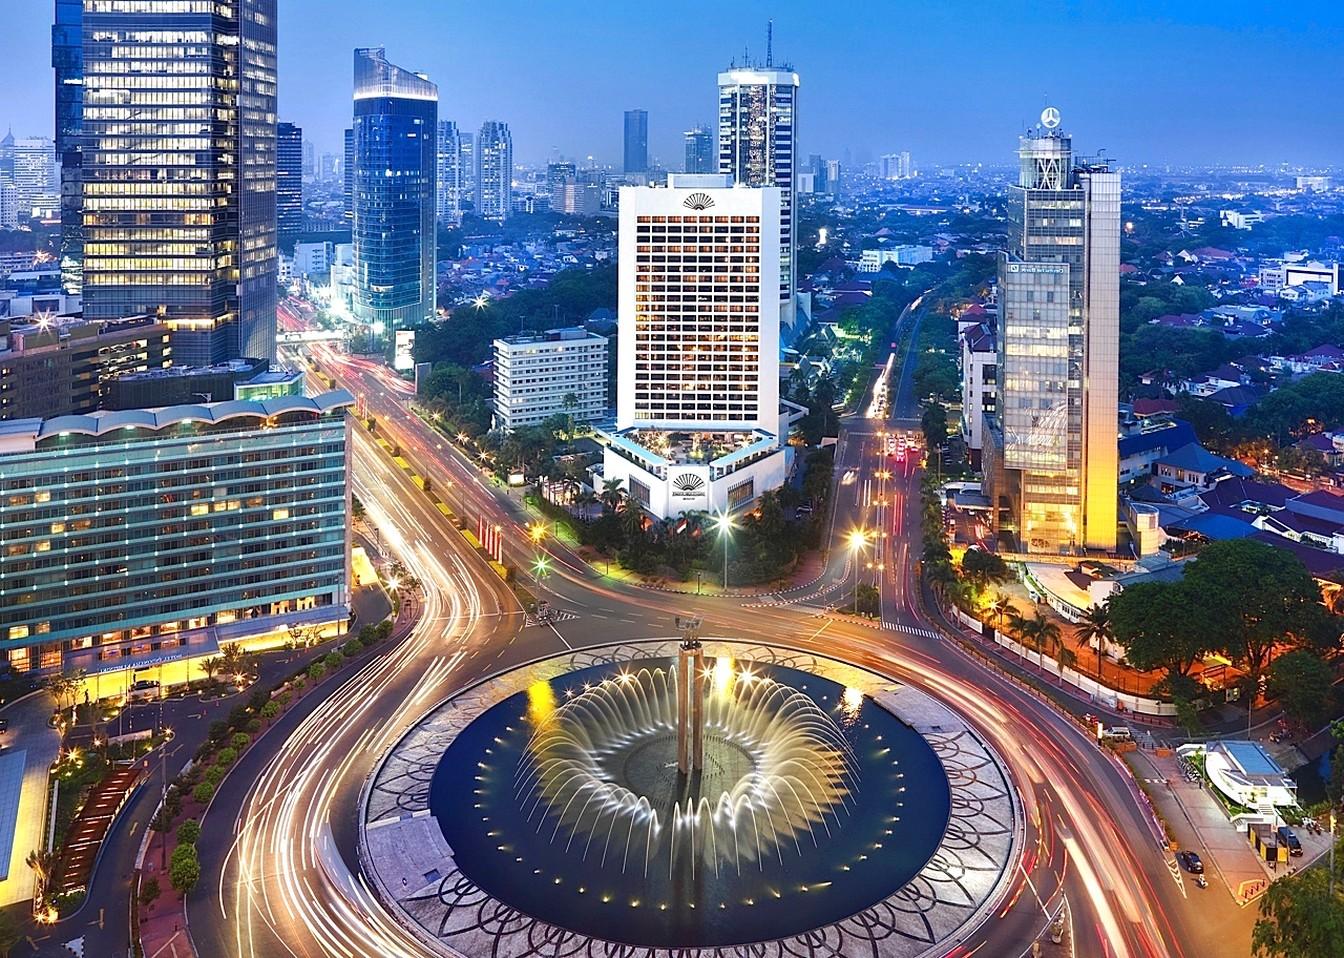 ISBC has been set up to strengthen business ties between Singapore and Indonesia.